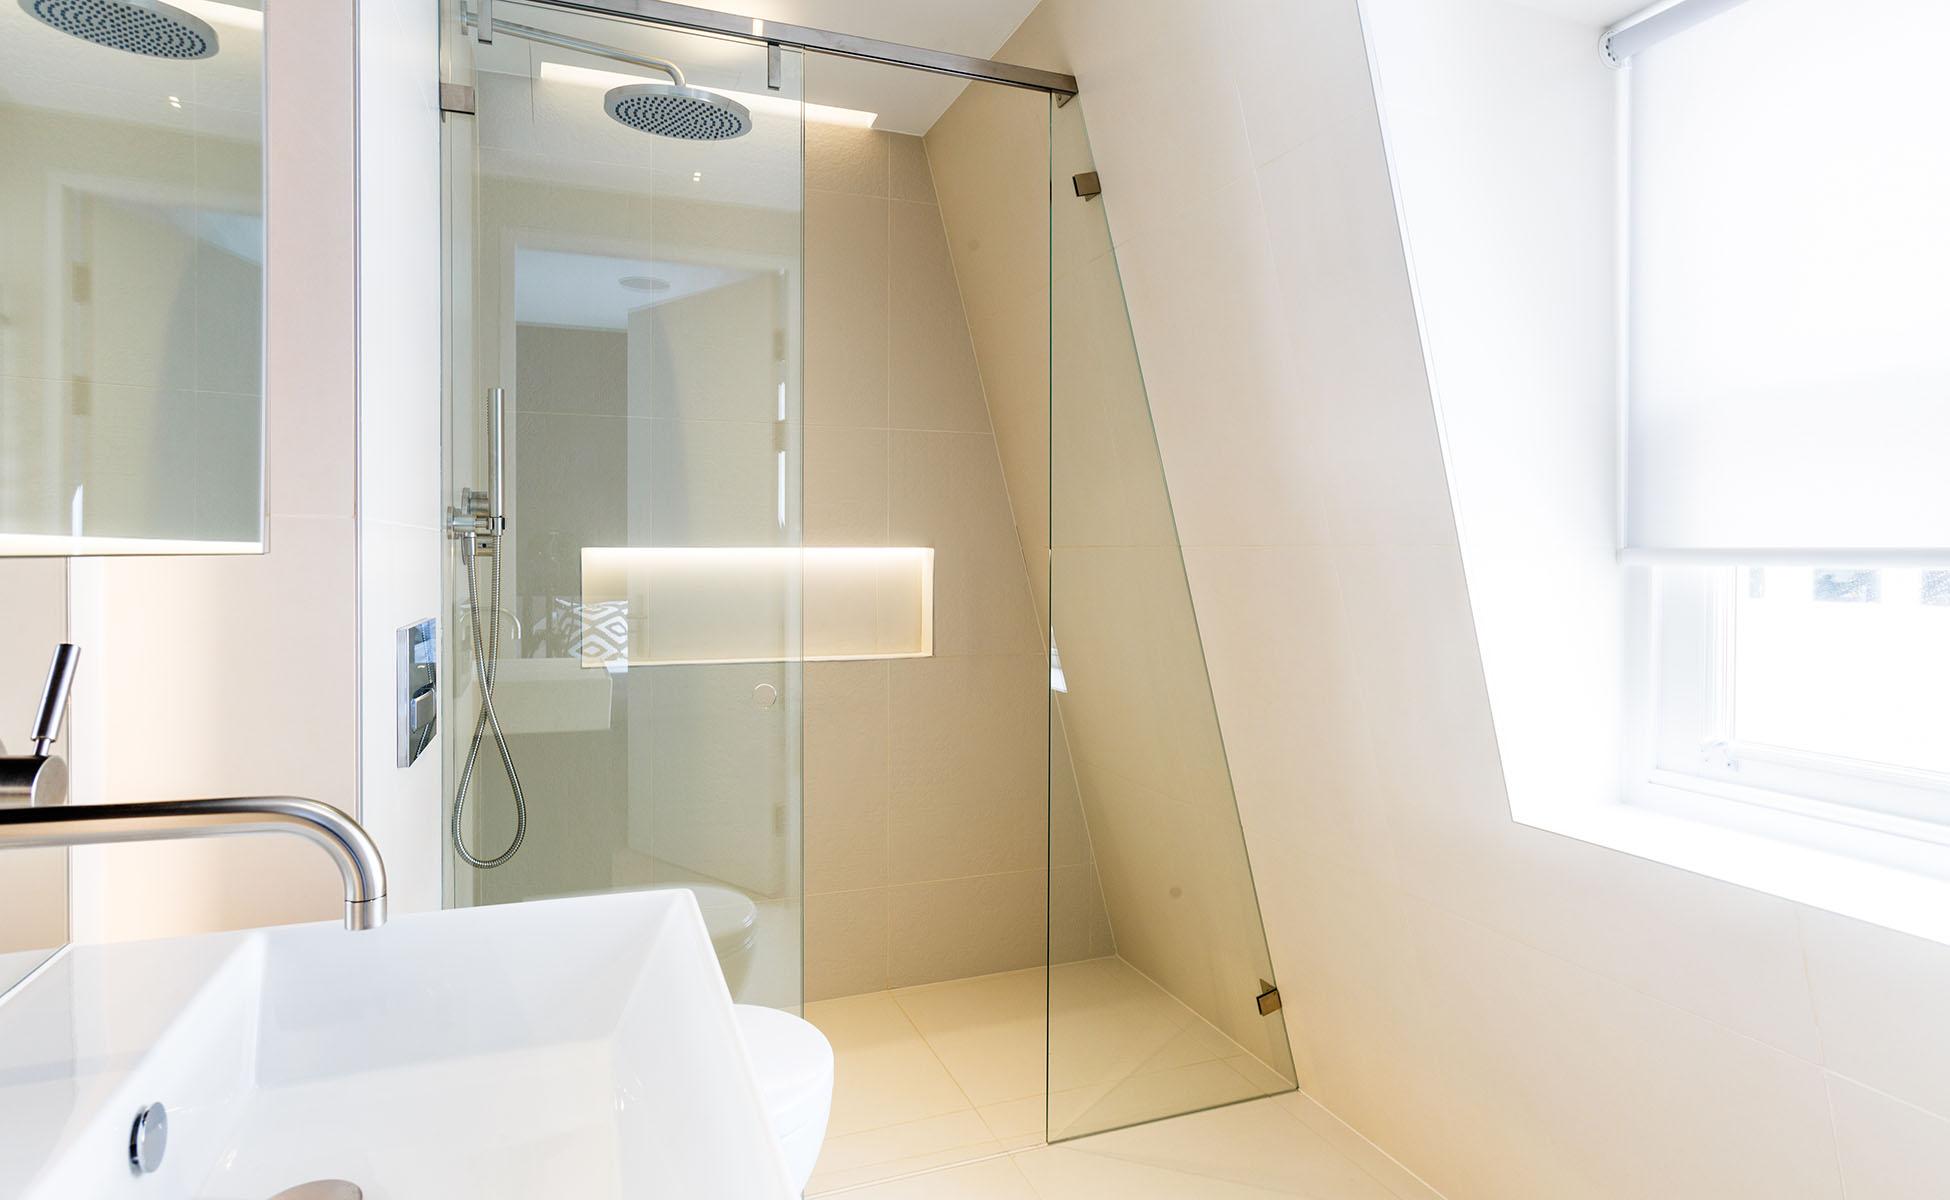 Lovelydays luxury service apartment rental - London - Fitzrovia - Newman Street IV - Lovelysuite - 2 bedrooms - 2 bathrooms - Lovely shower - rent luxury apartment london - 97d3ff45fae3 - Lovelydays